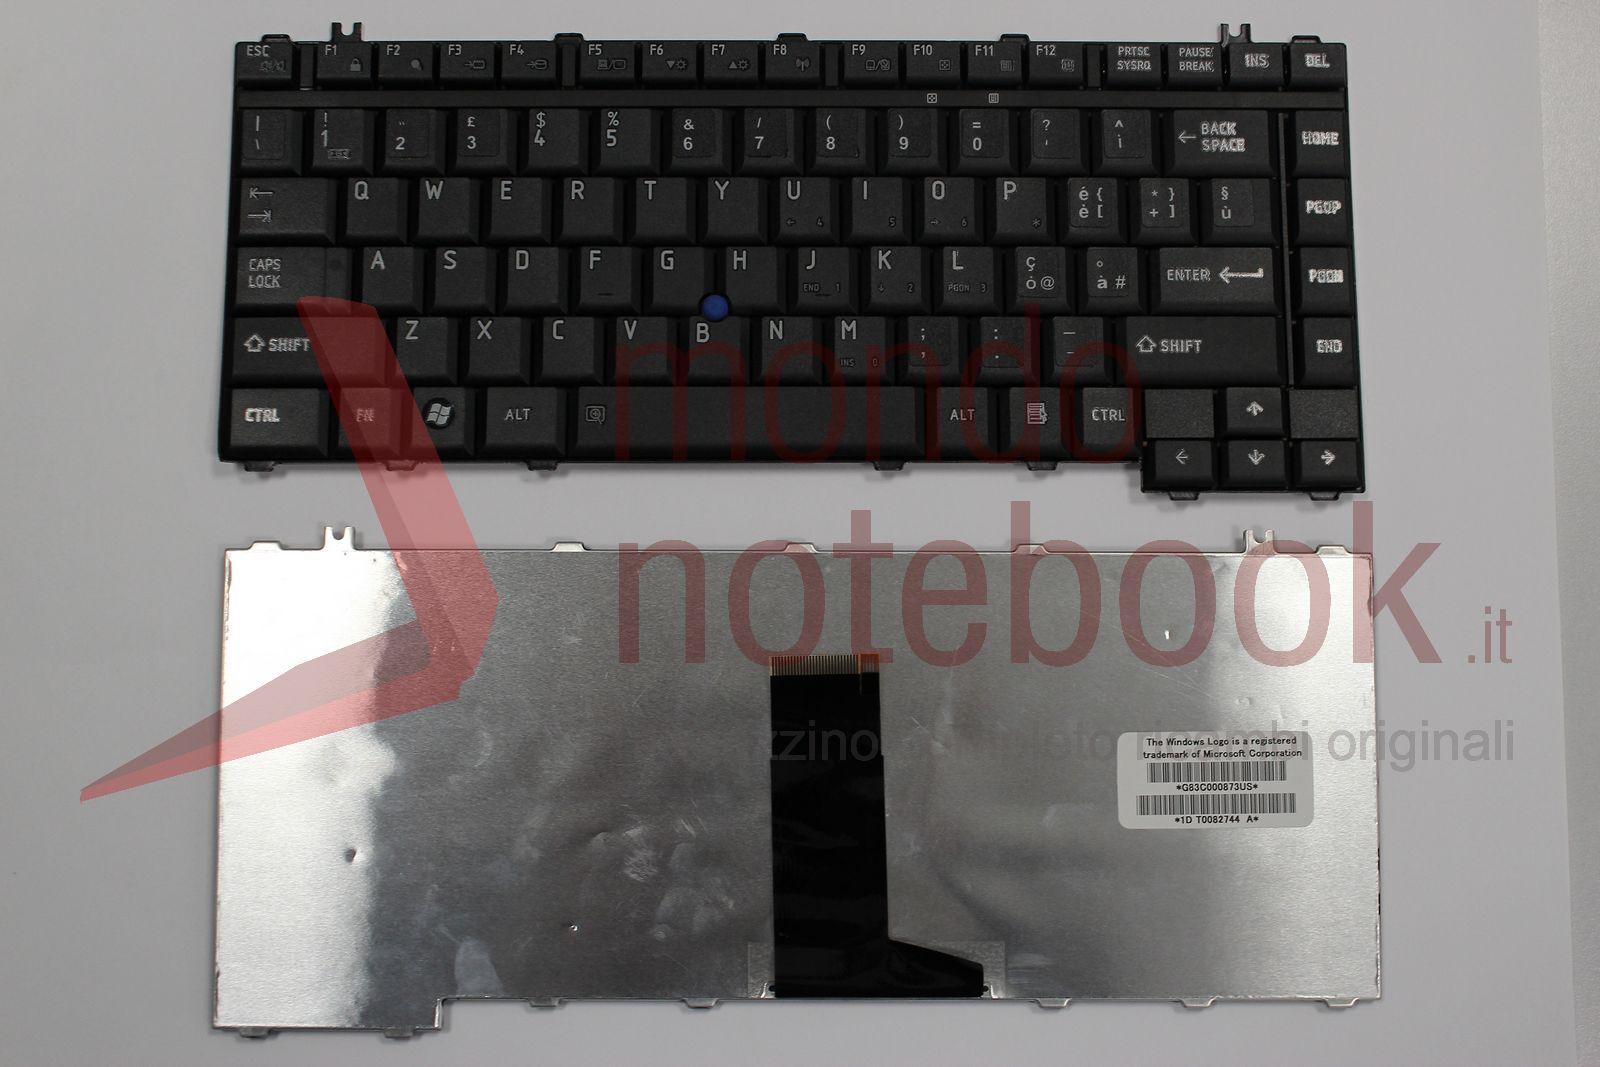 https://www.mondonotebook.it/2351/tastiera-notebook-toshiba-satellite-a200-m200-l300-l305-a300-nera-con-trackpad-con-adesivi-layout-ita.jpg